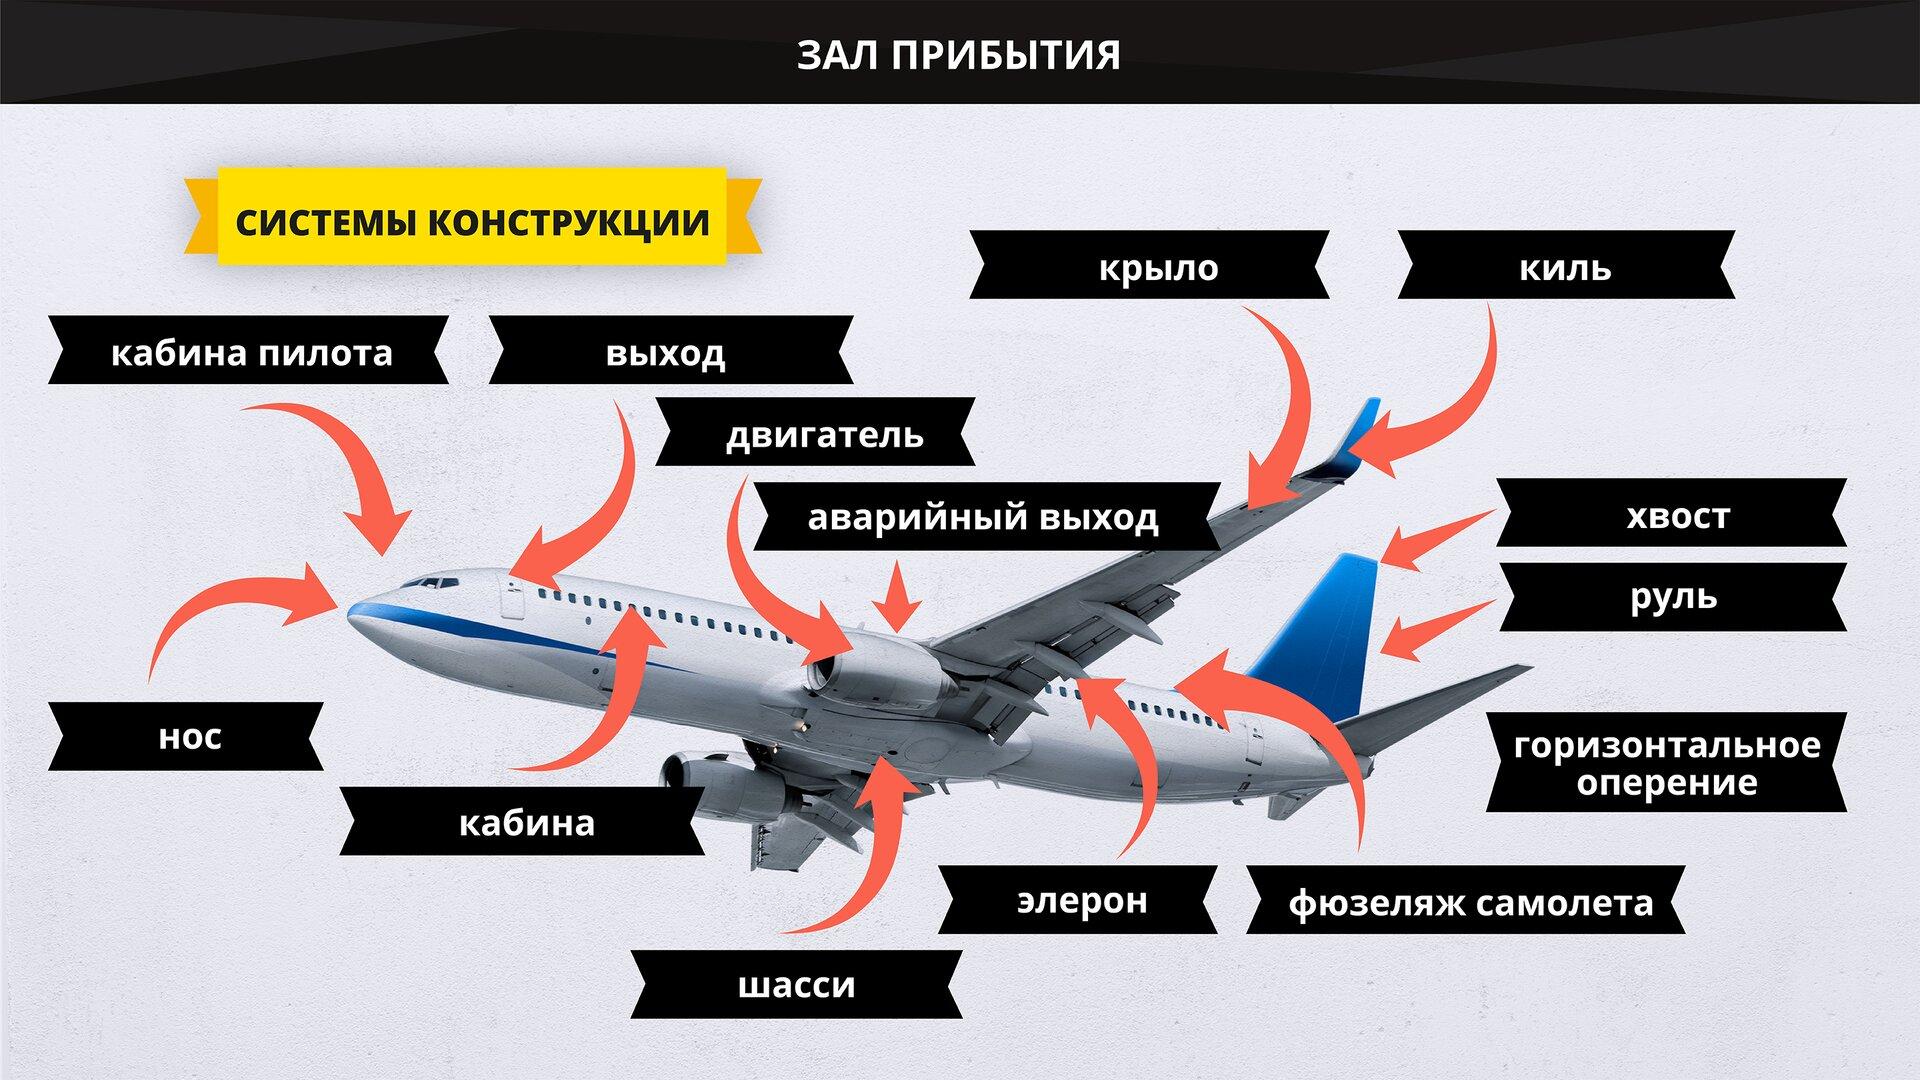 На изображении представлены элементы конструкции самолета. Grafika przedstawia główne zespoły konstrukcyjne samolotu.